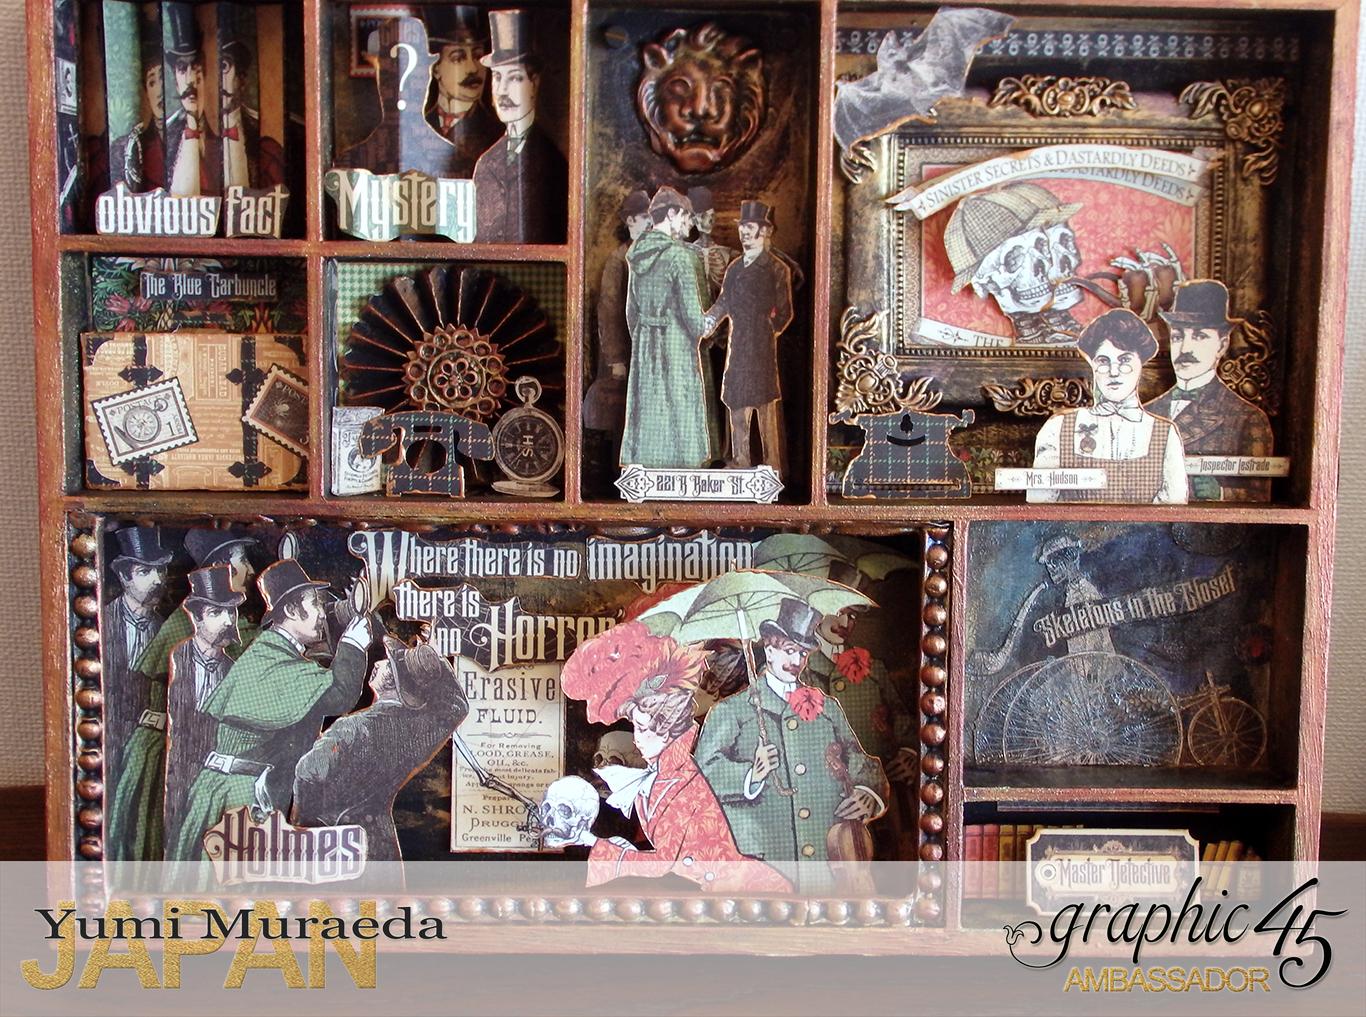 7yuyu3MasterdetactiveSecretRoomdesignbyYumiMuraedaProductByGraphic45のコピー